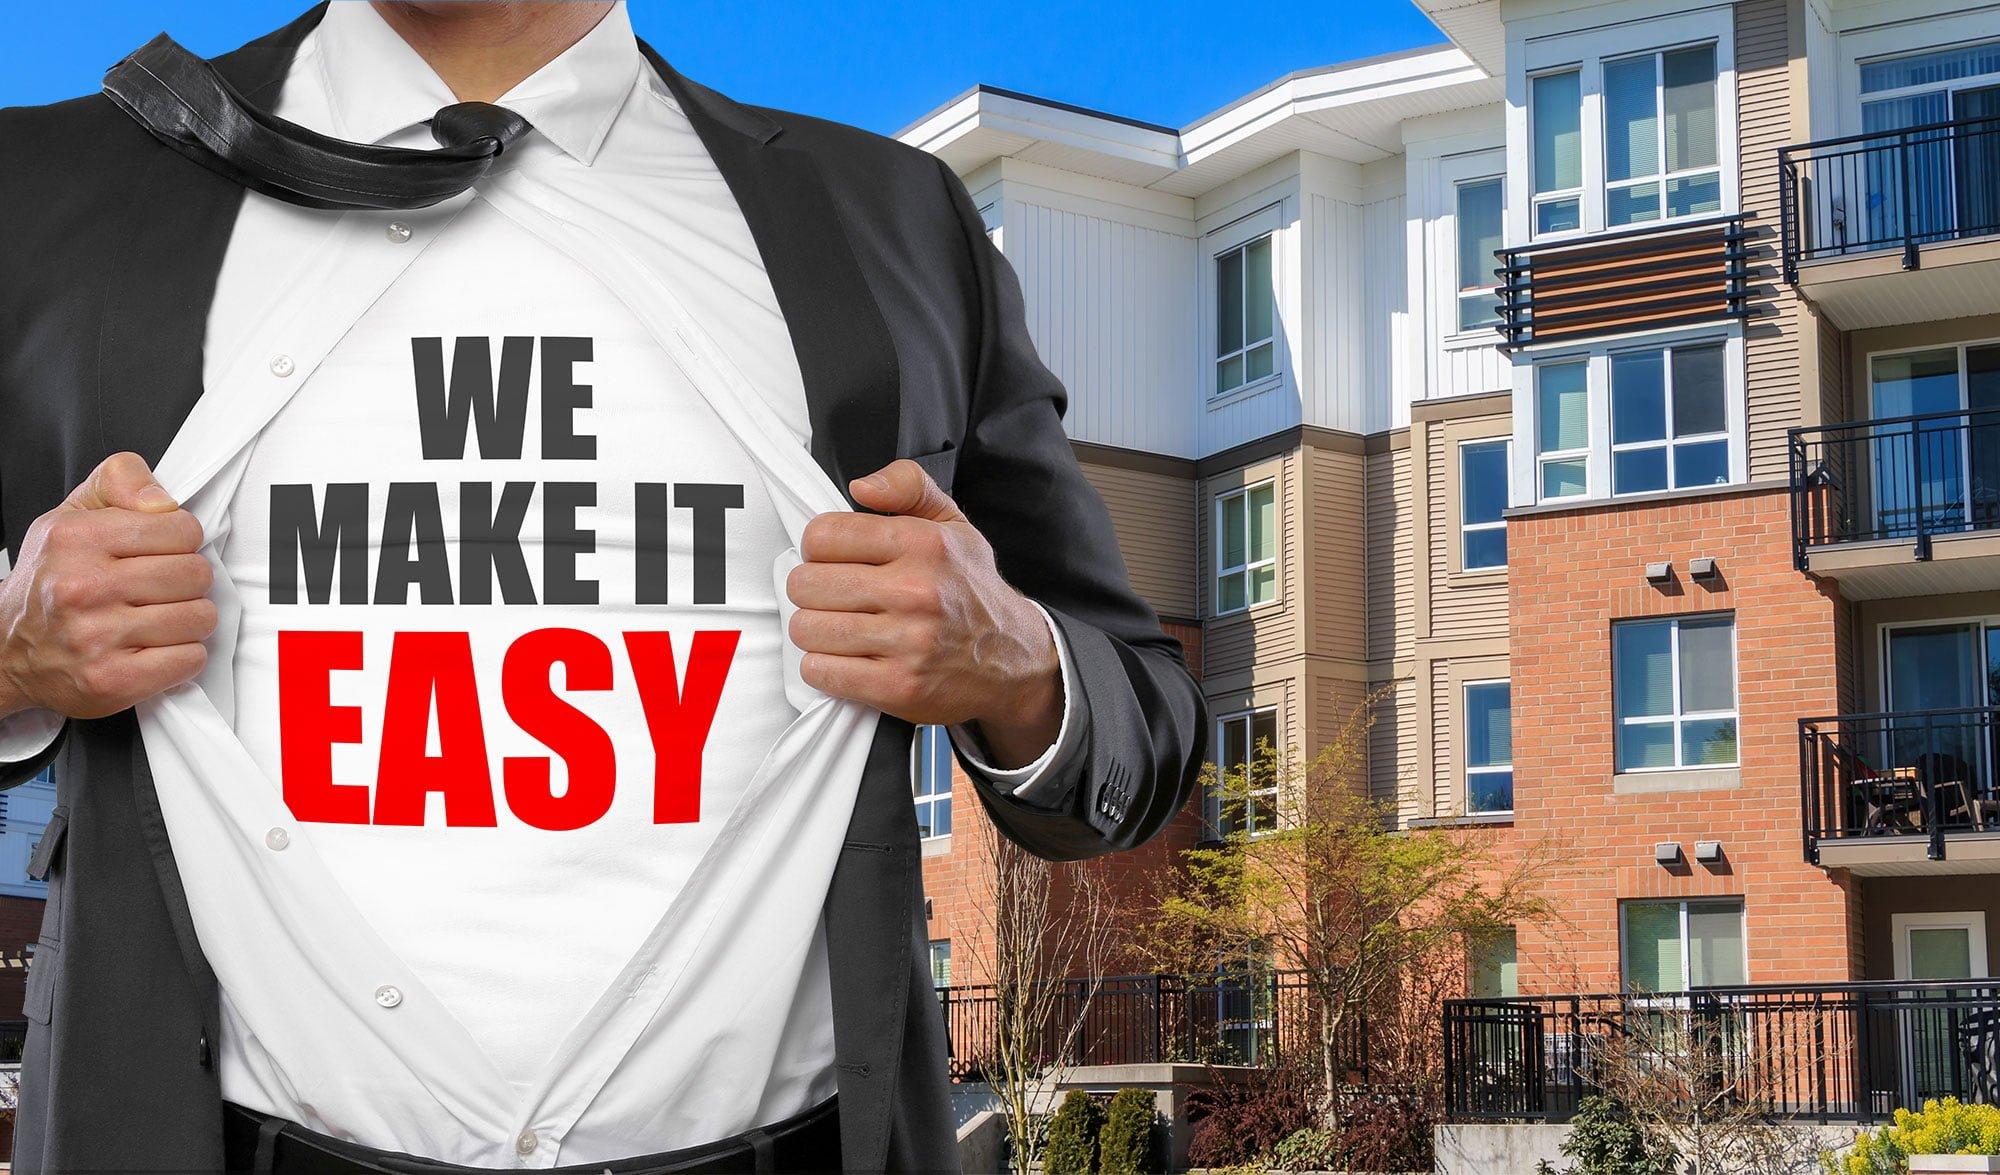 Easy condo insurance